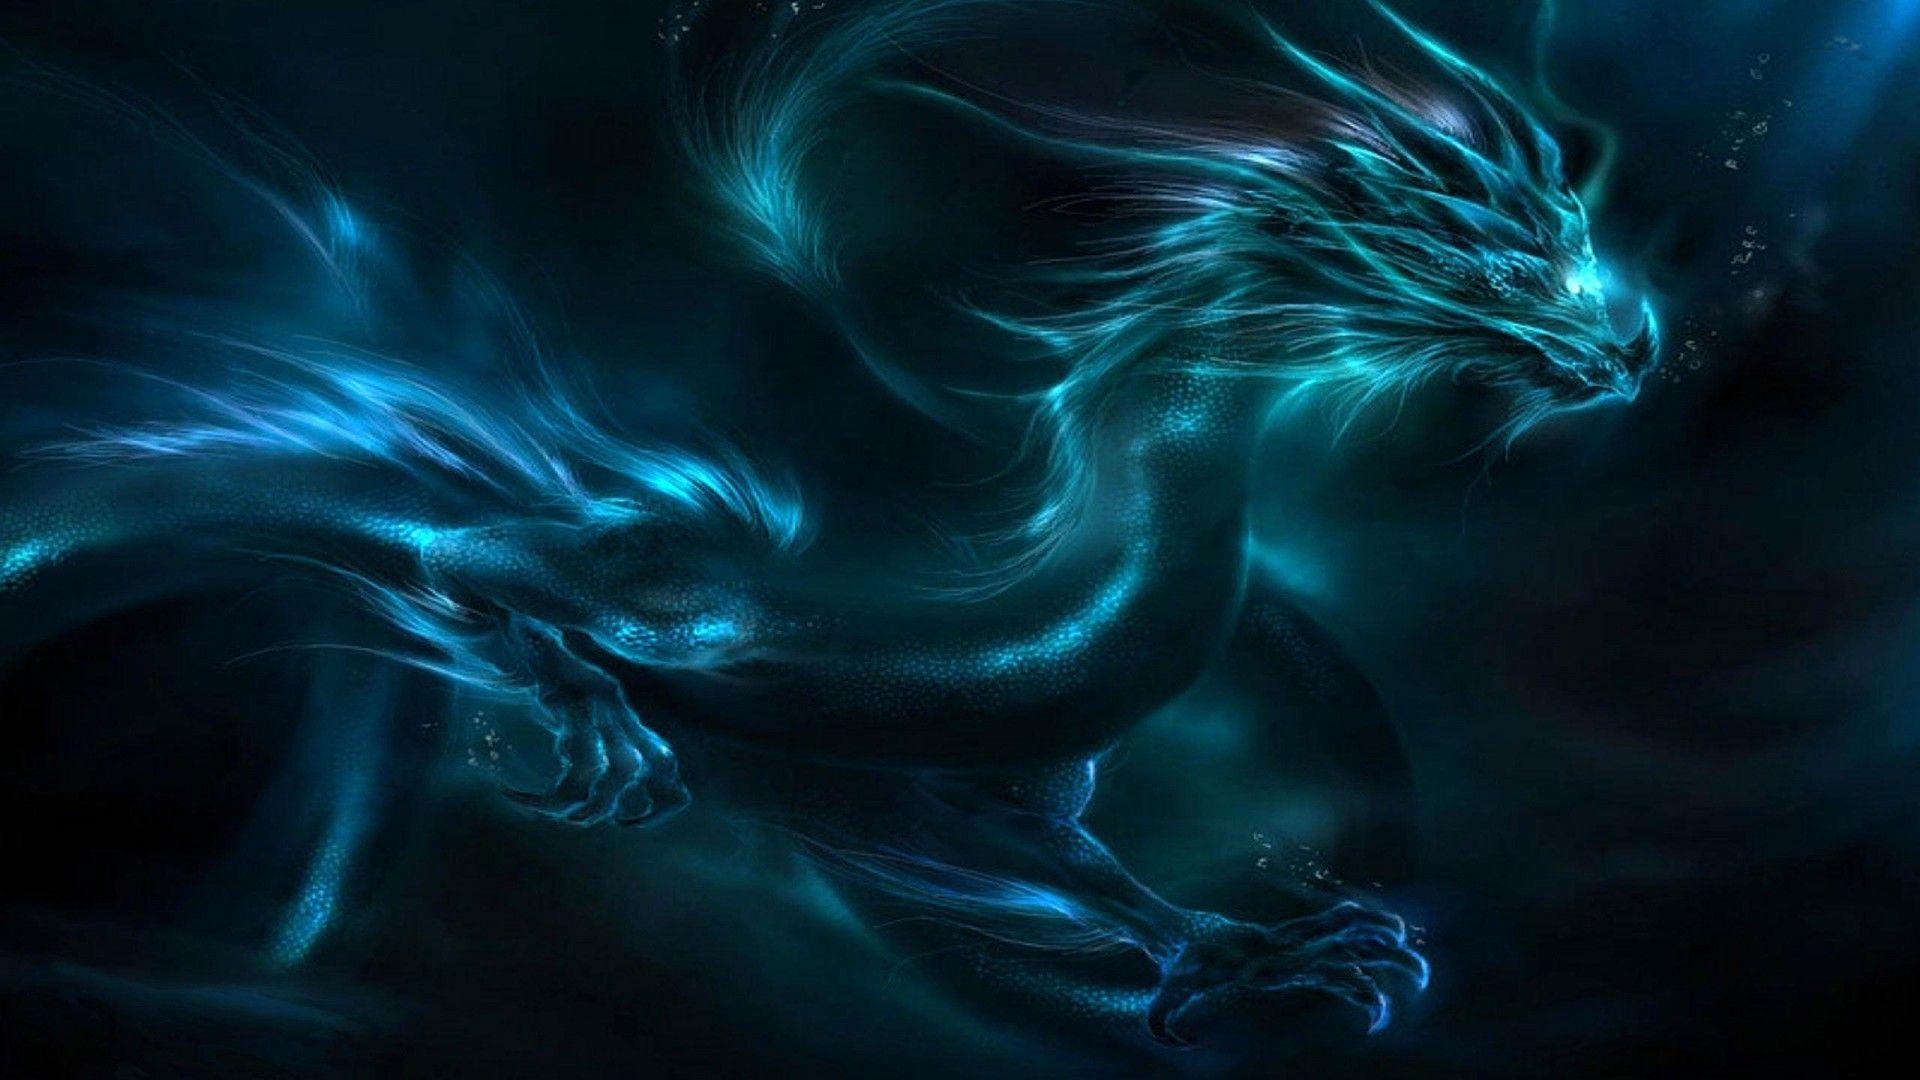 the dragon theme